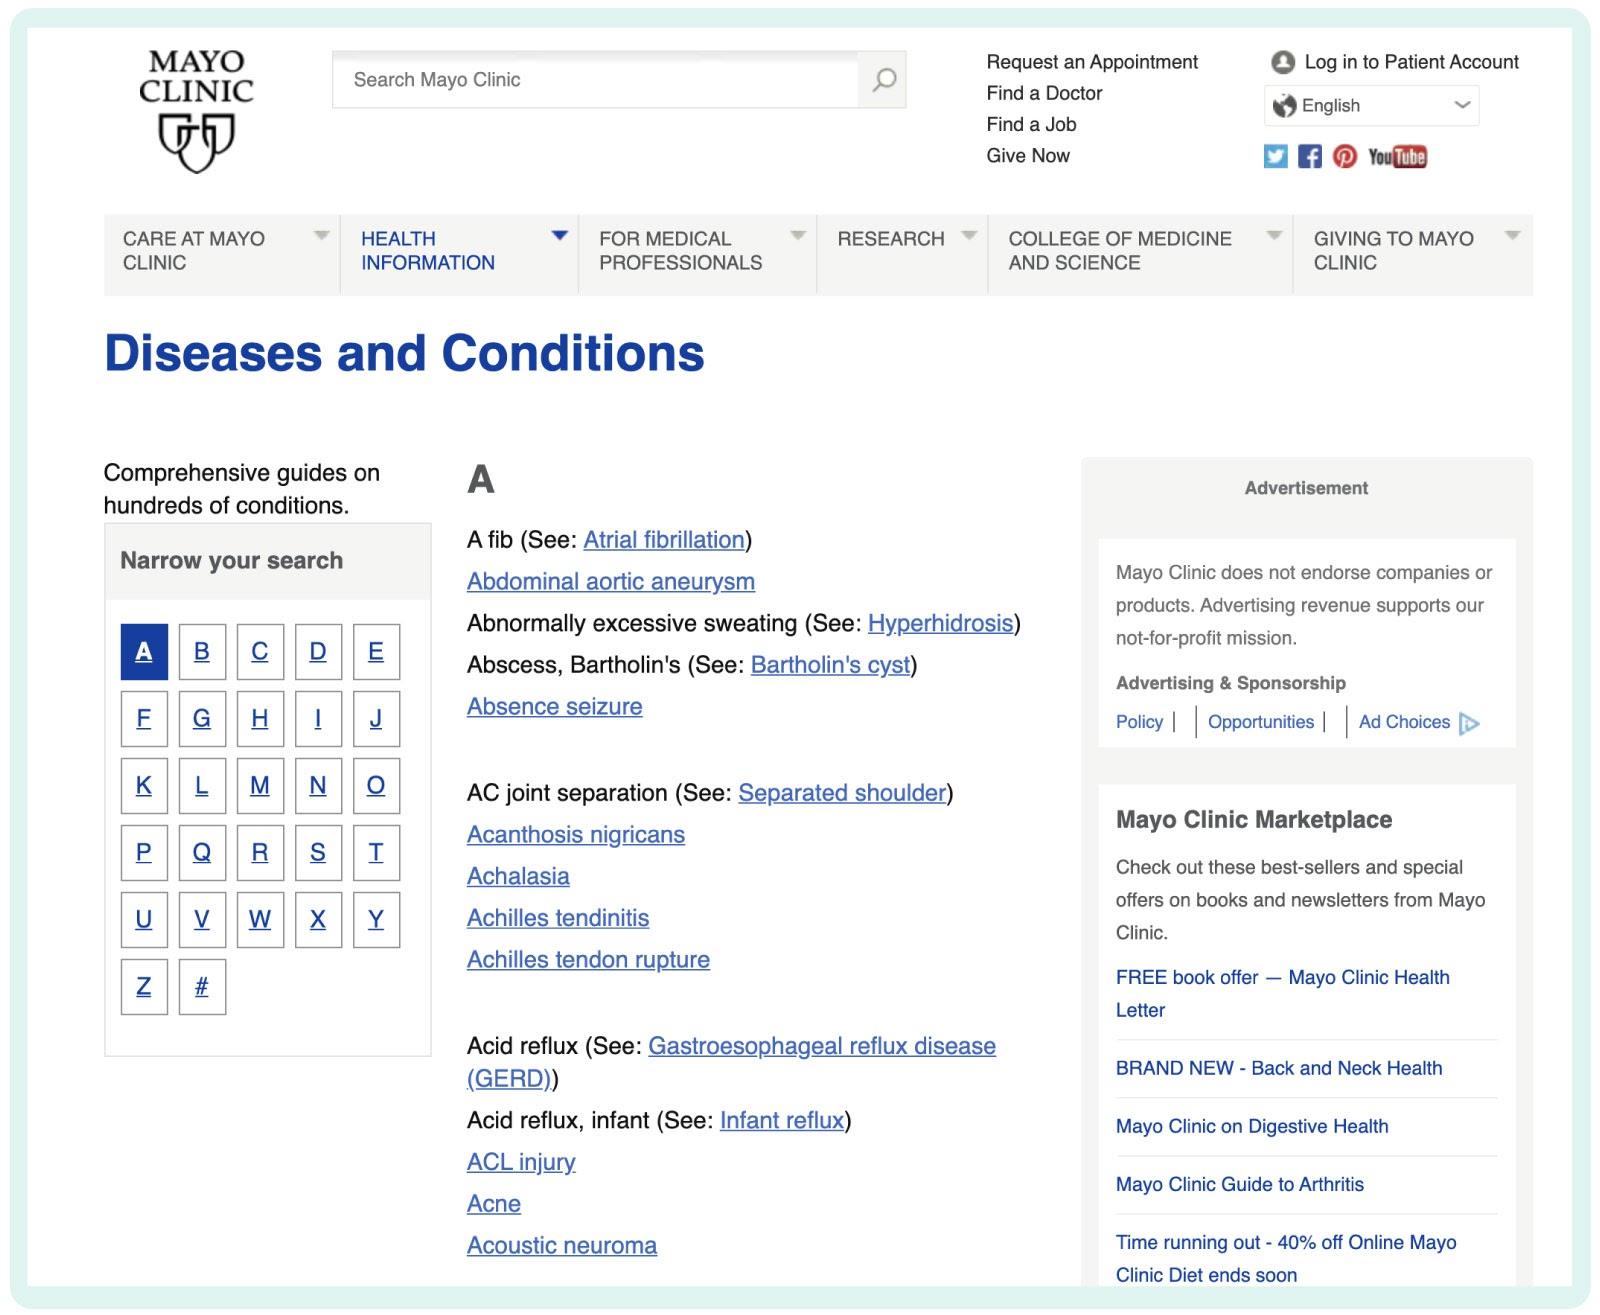 Mayo Clinic content matirix